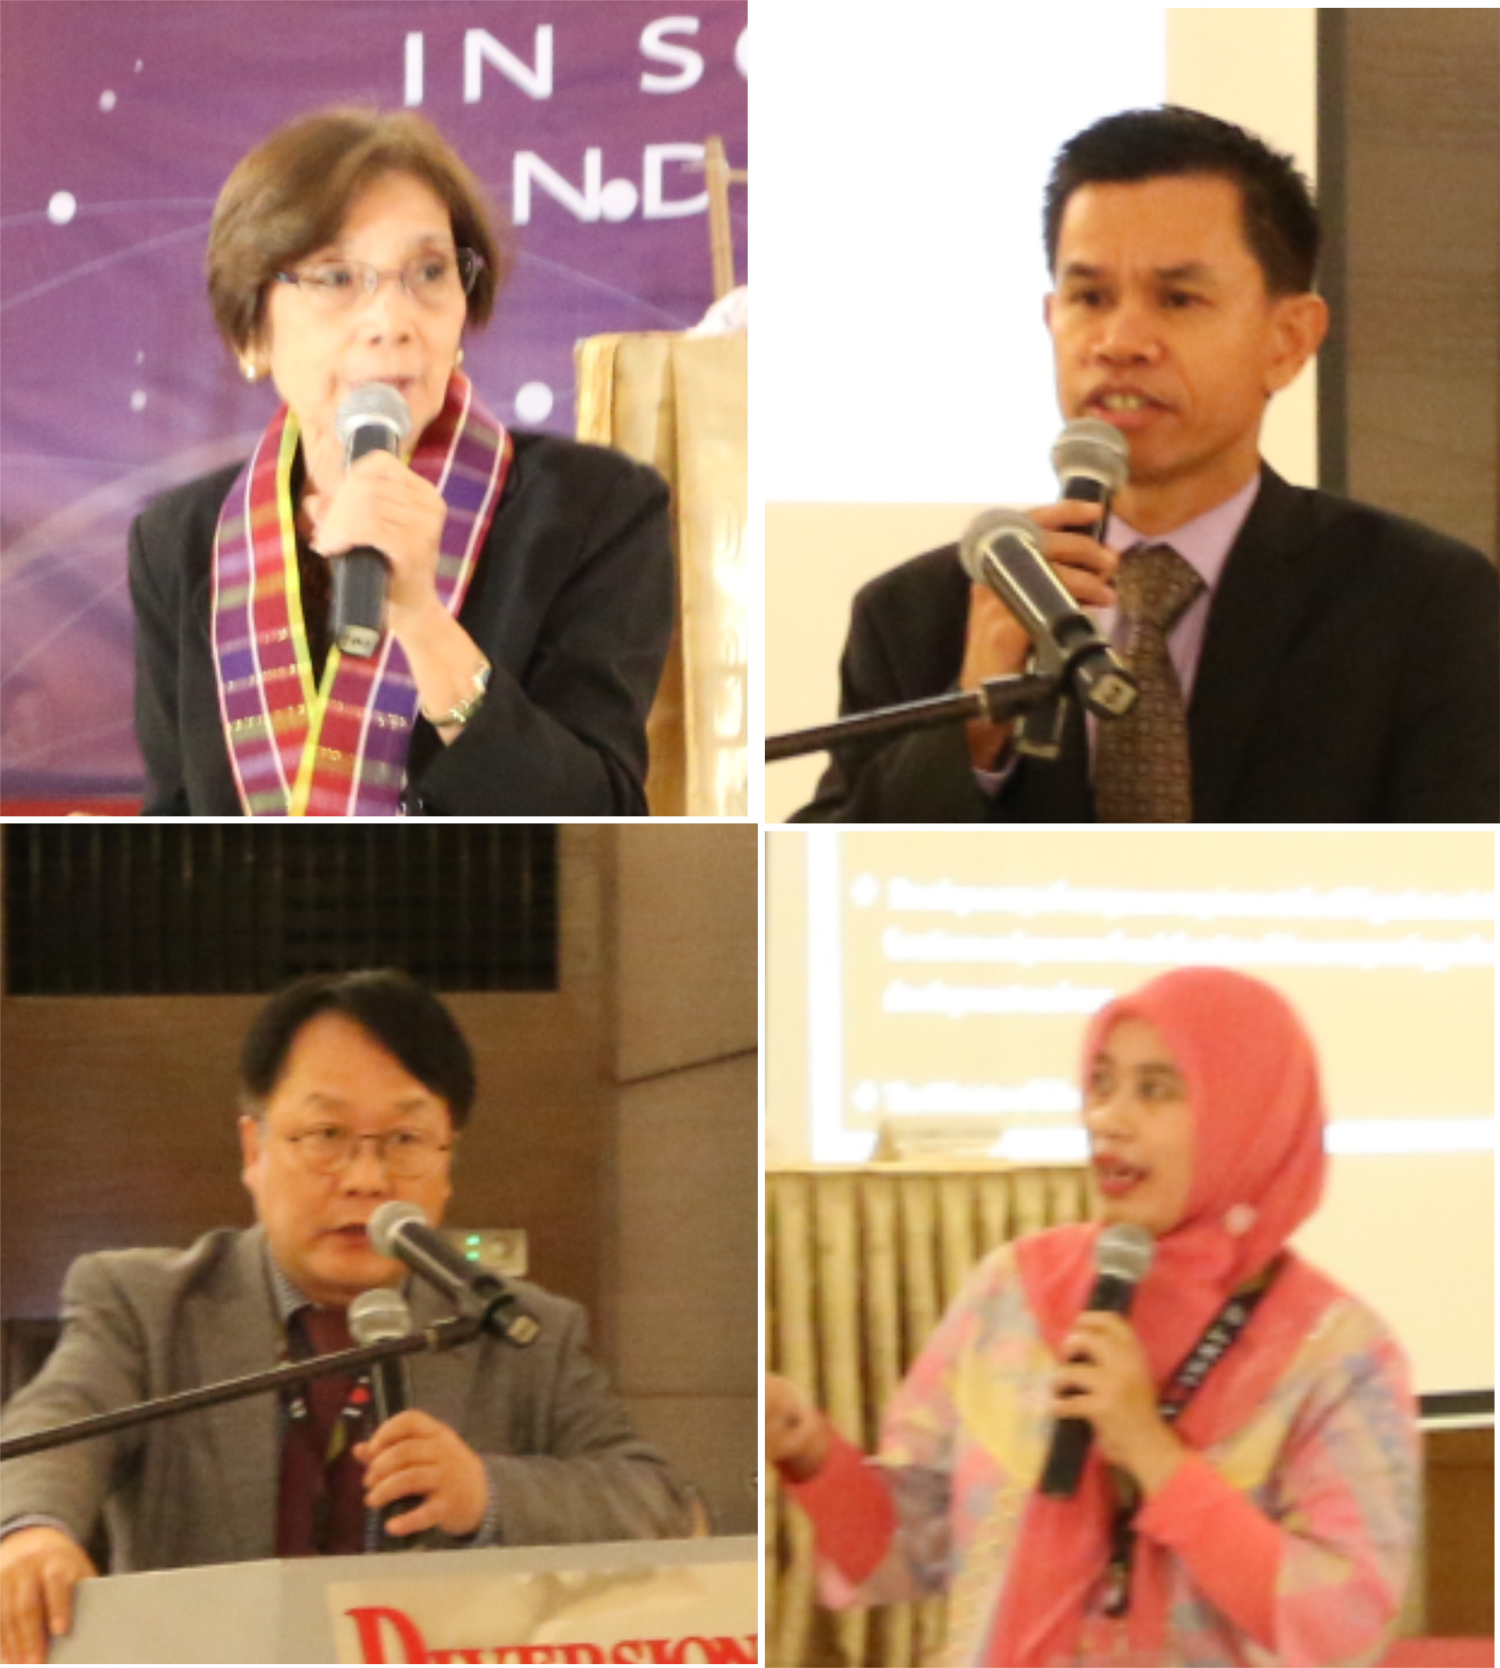 The plenary speakers. clockwise: Dr. Alumanda M. De La Rosa, Dr. Leonardo S. Sotaridona, Anita Widiawati and Dr. Hwang Gyu-Hee